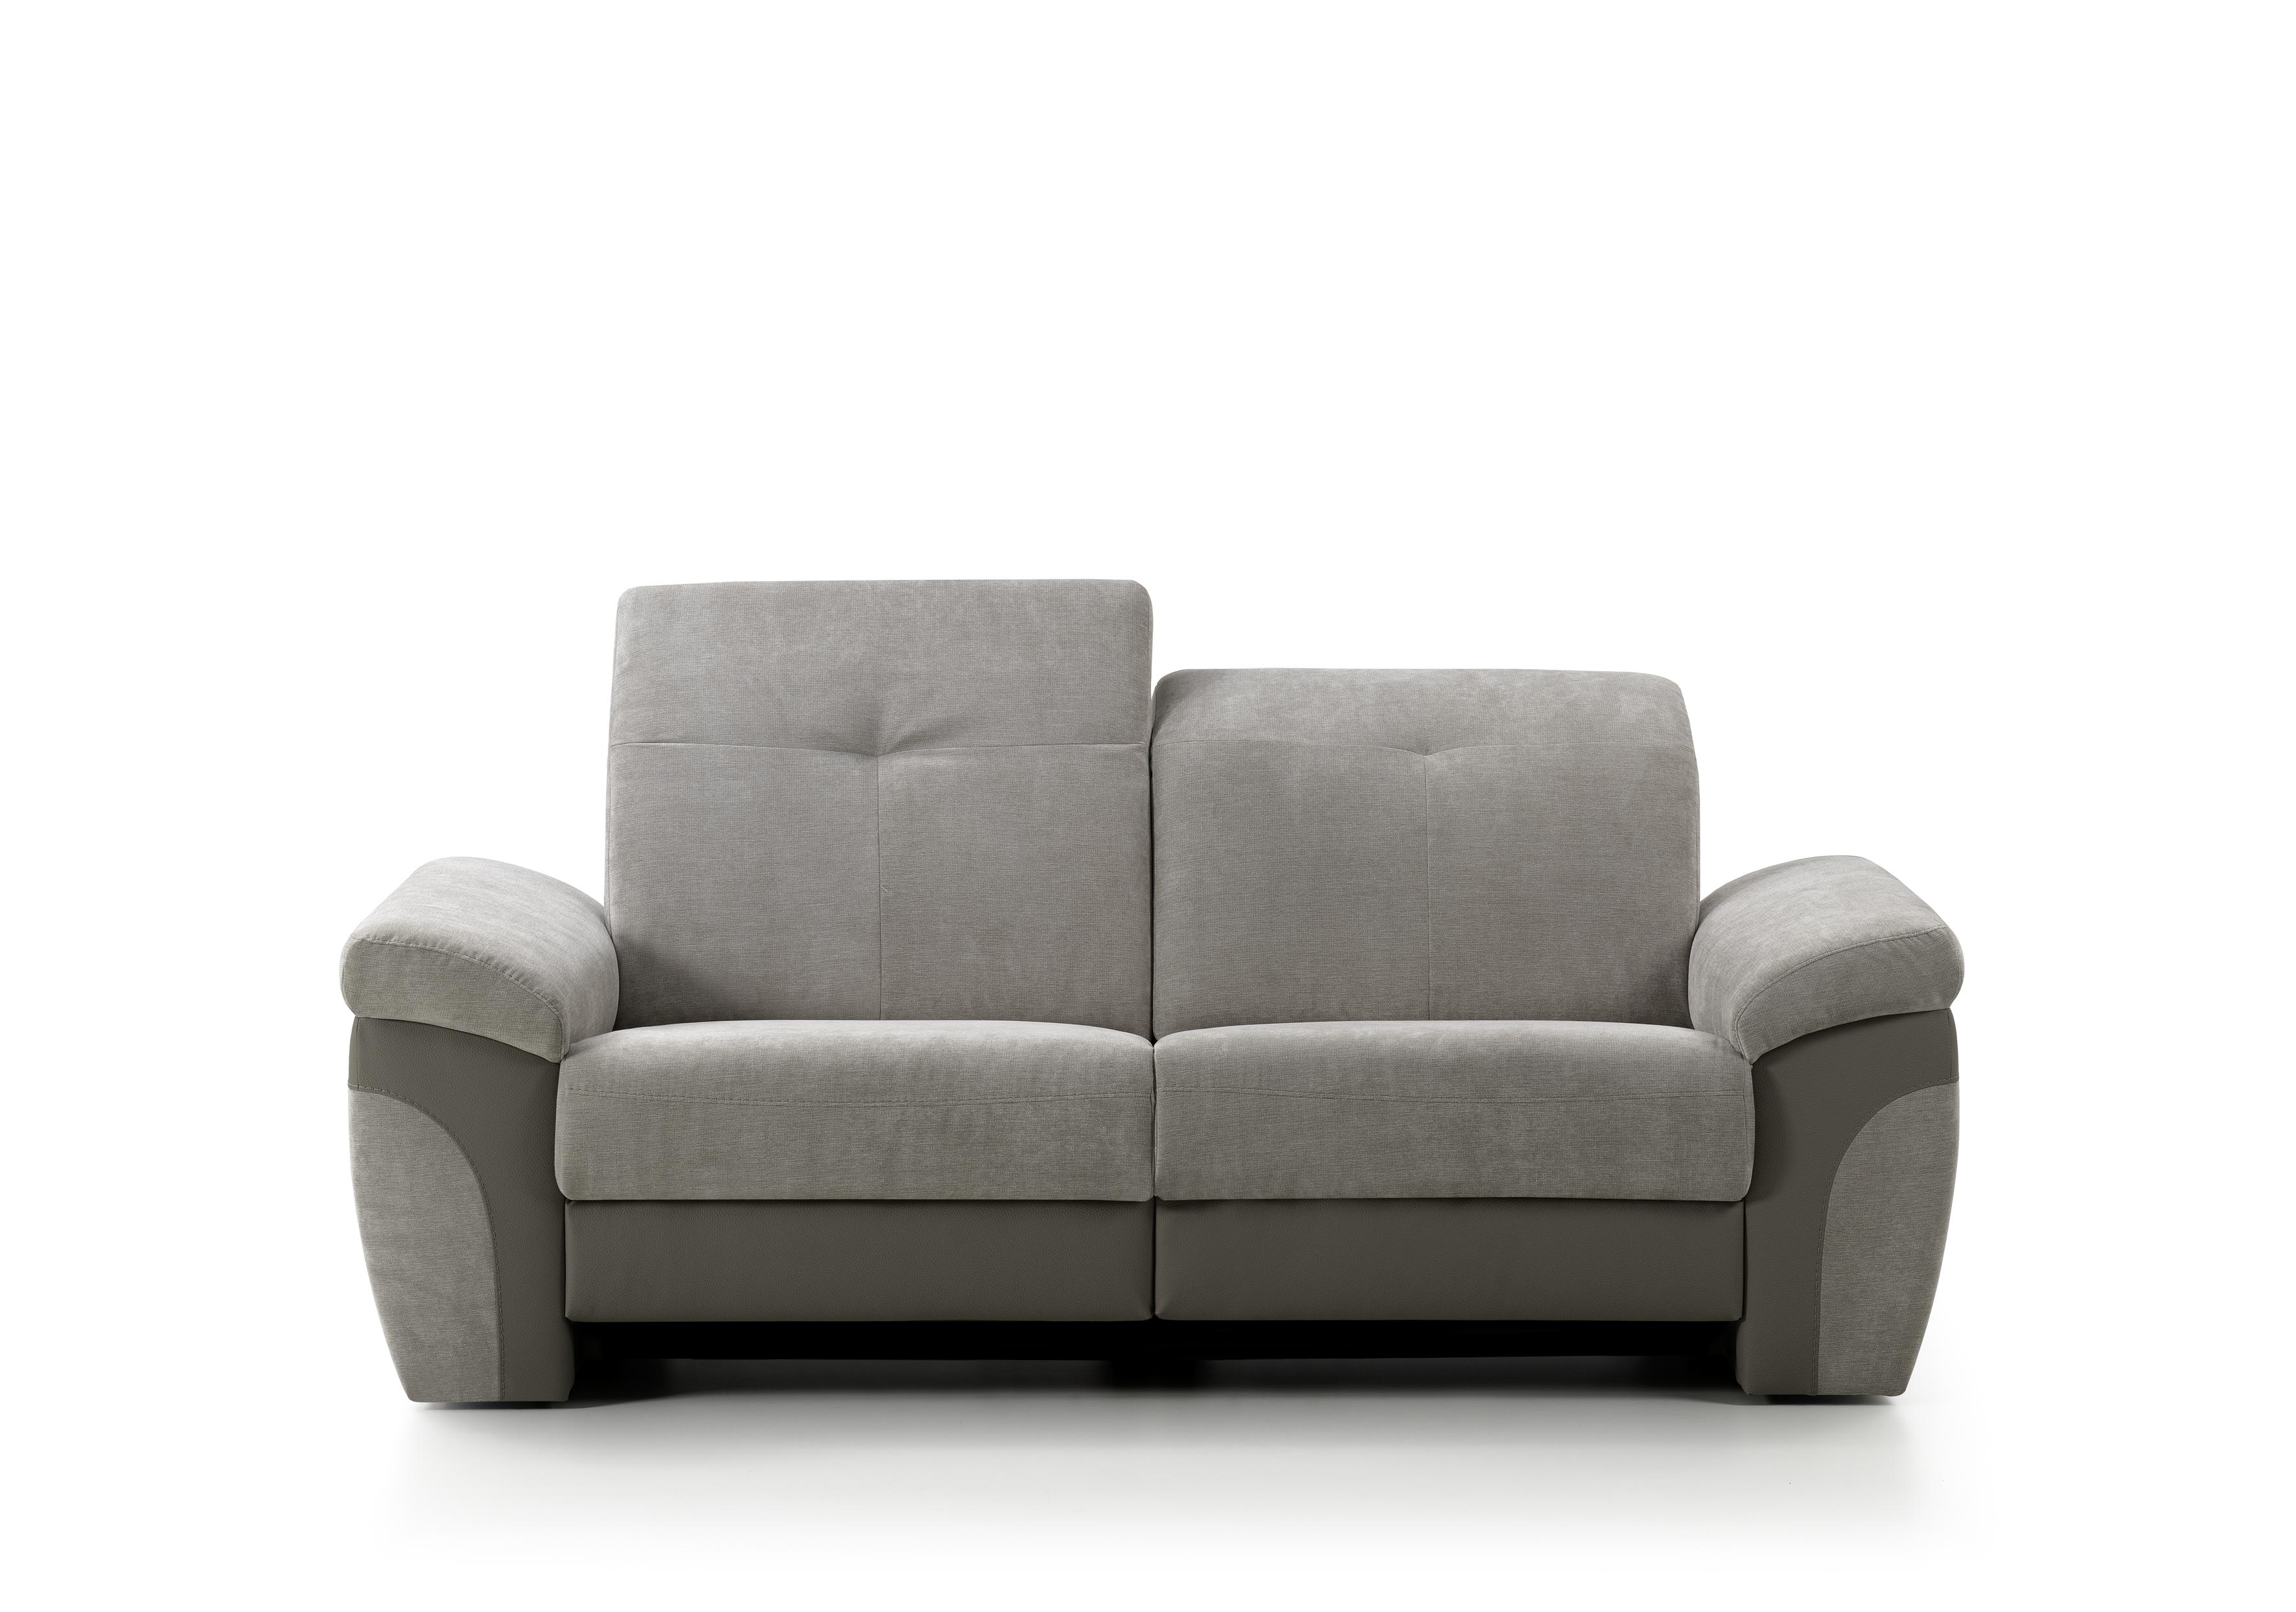 ol ron meubles hermes ol ron meubles. Black Bedroom Furniture Sets. Home Design Ideas